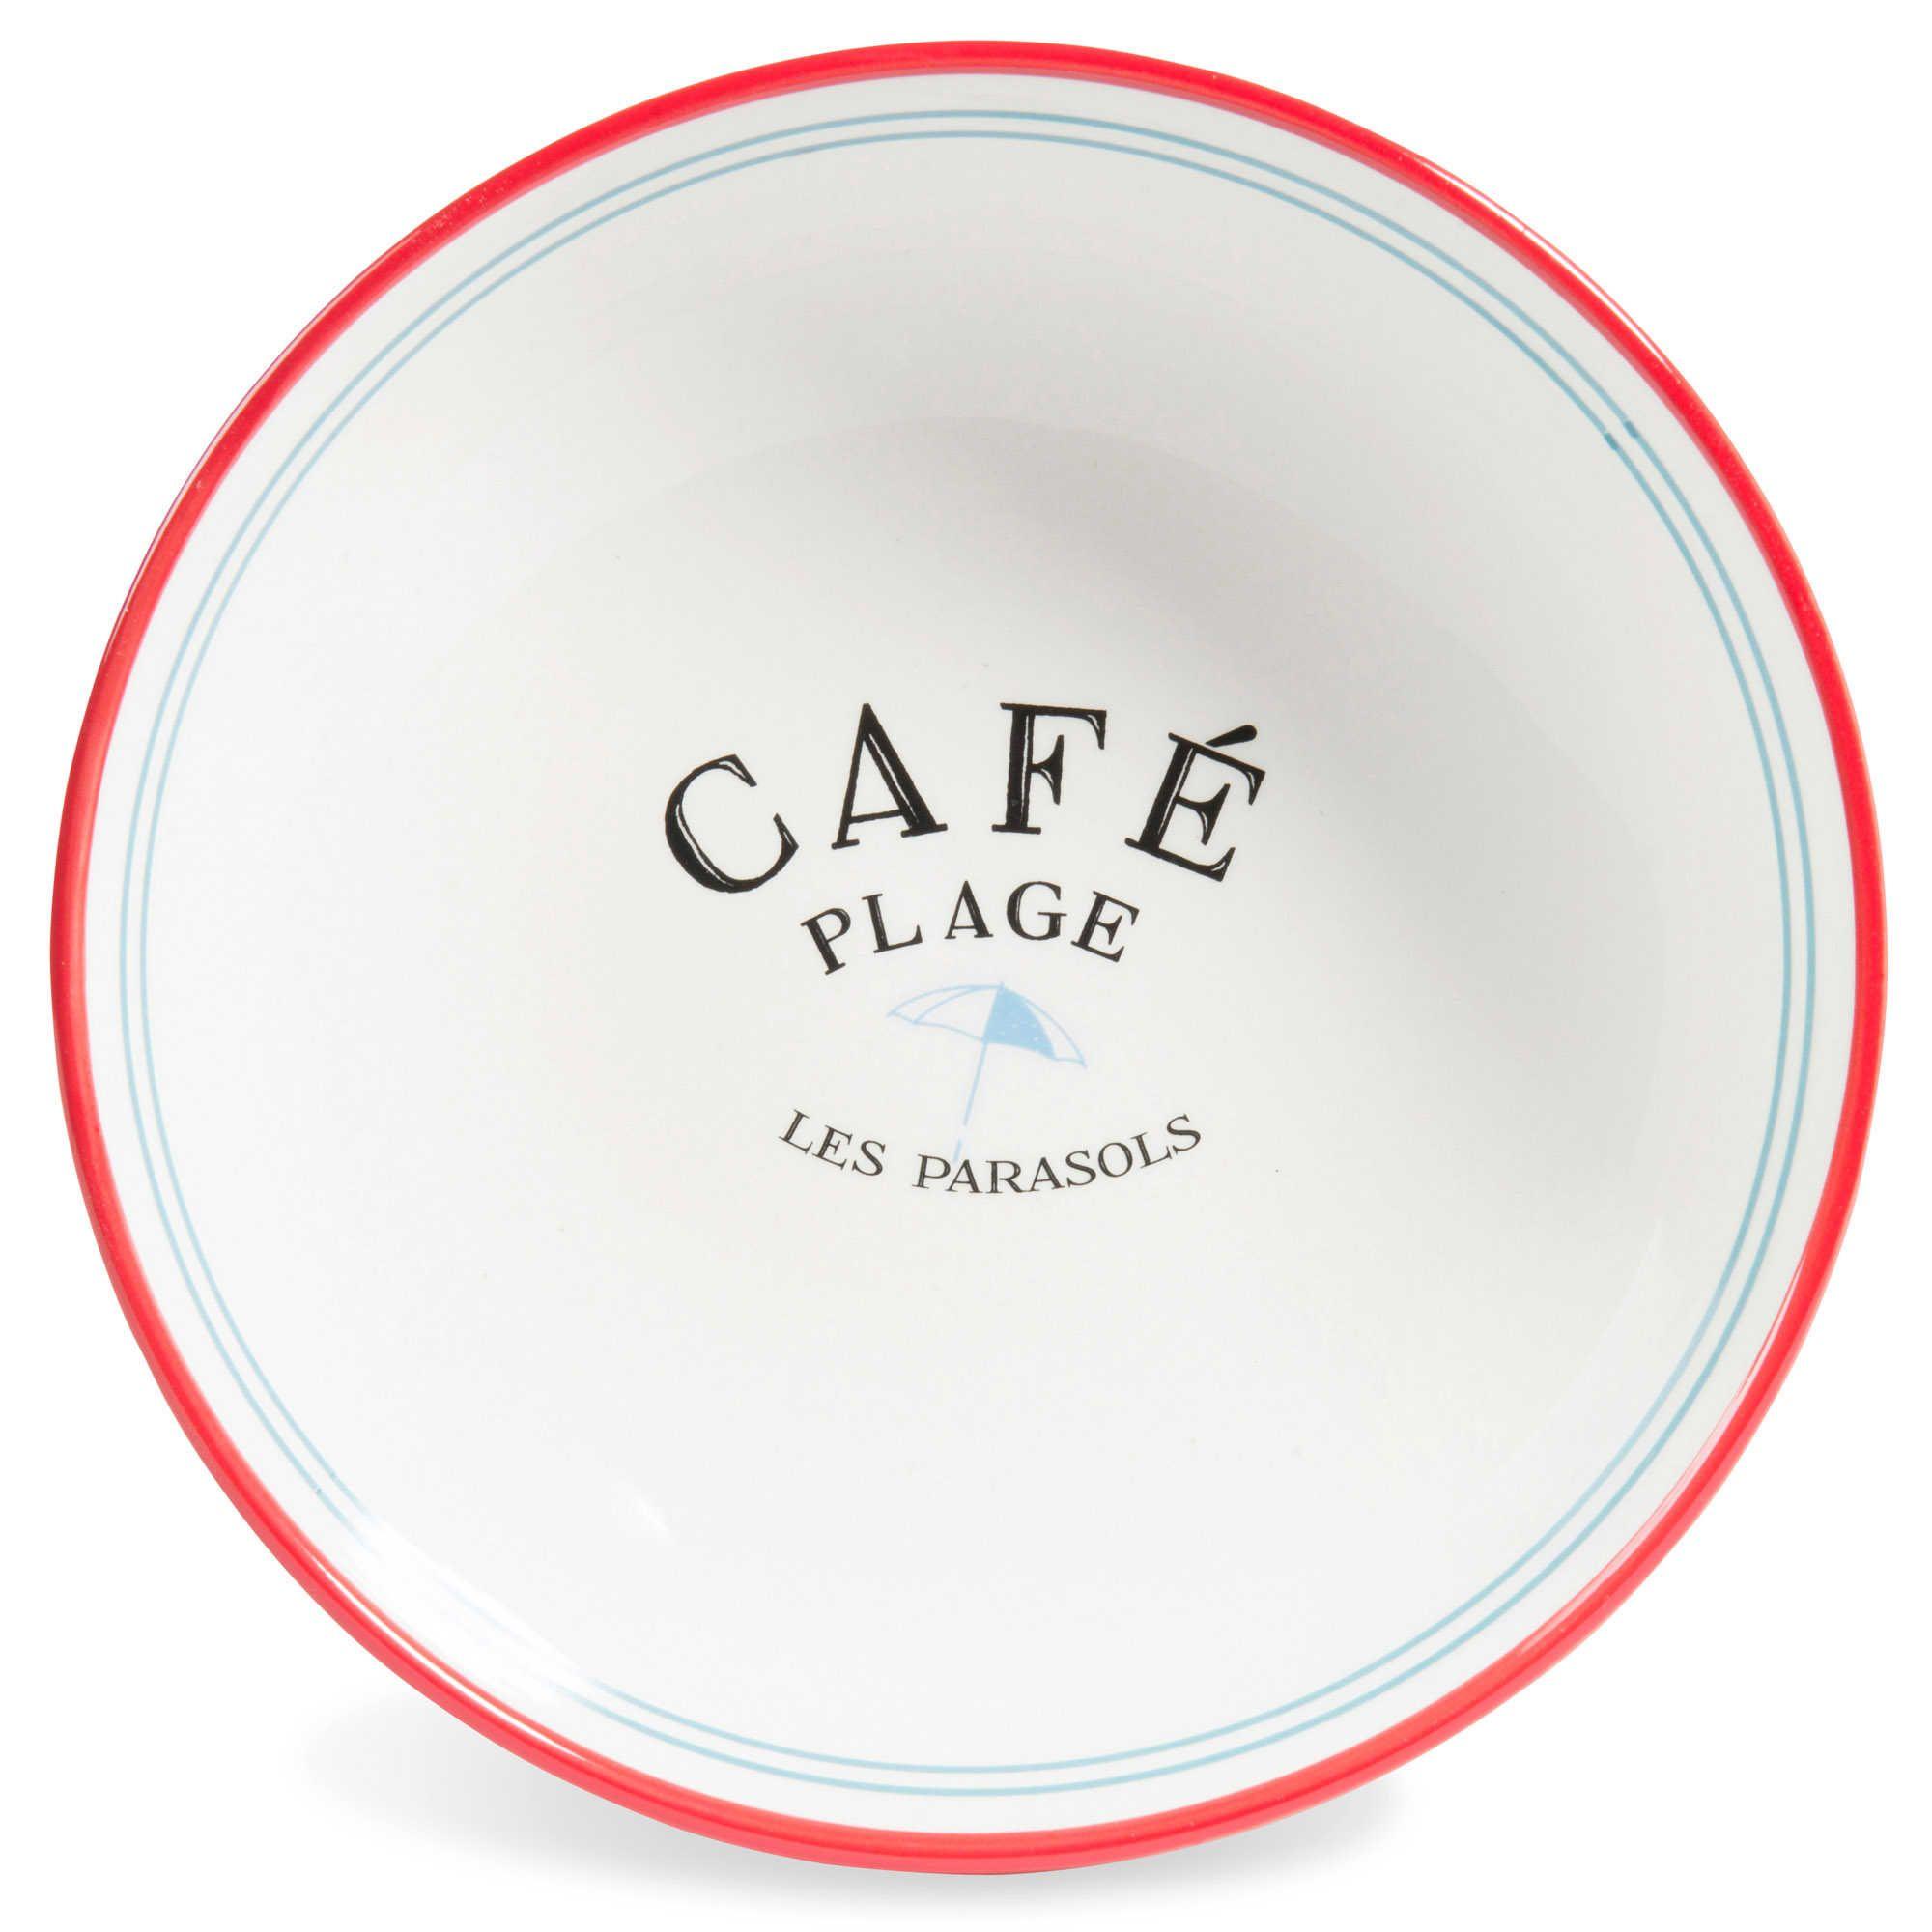 0a43e24942ee337071c2c0f9db6f67b1 Meilleur De De Parasol Design Concept